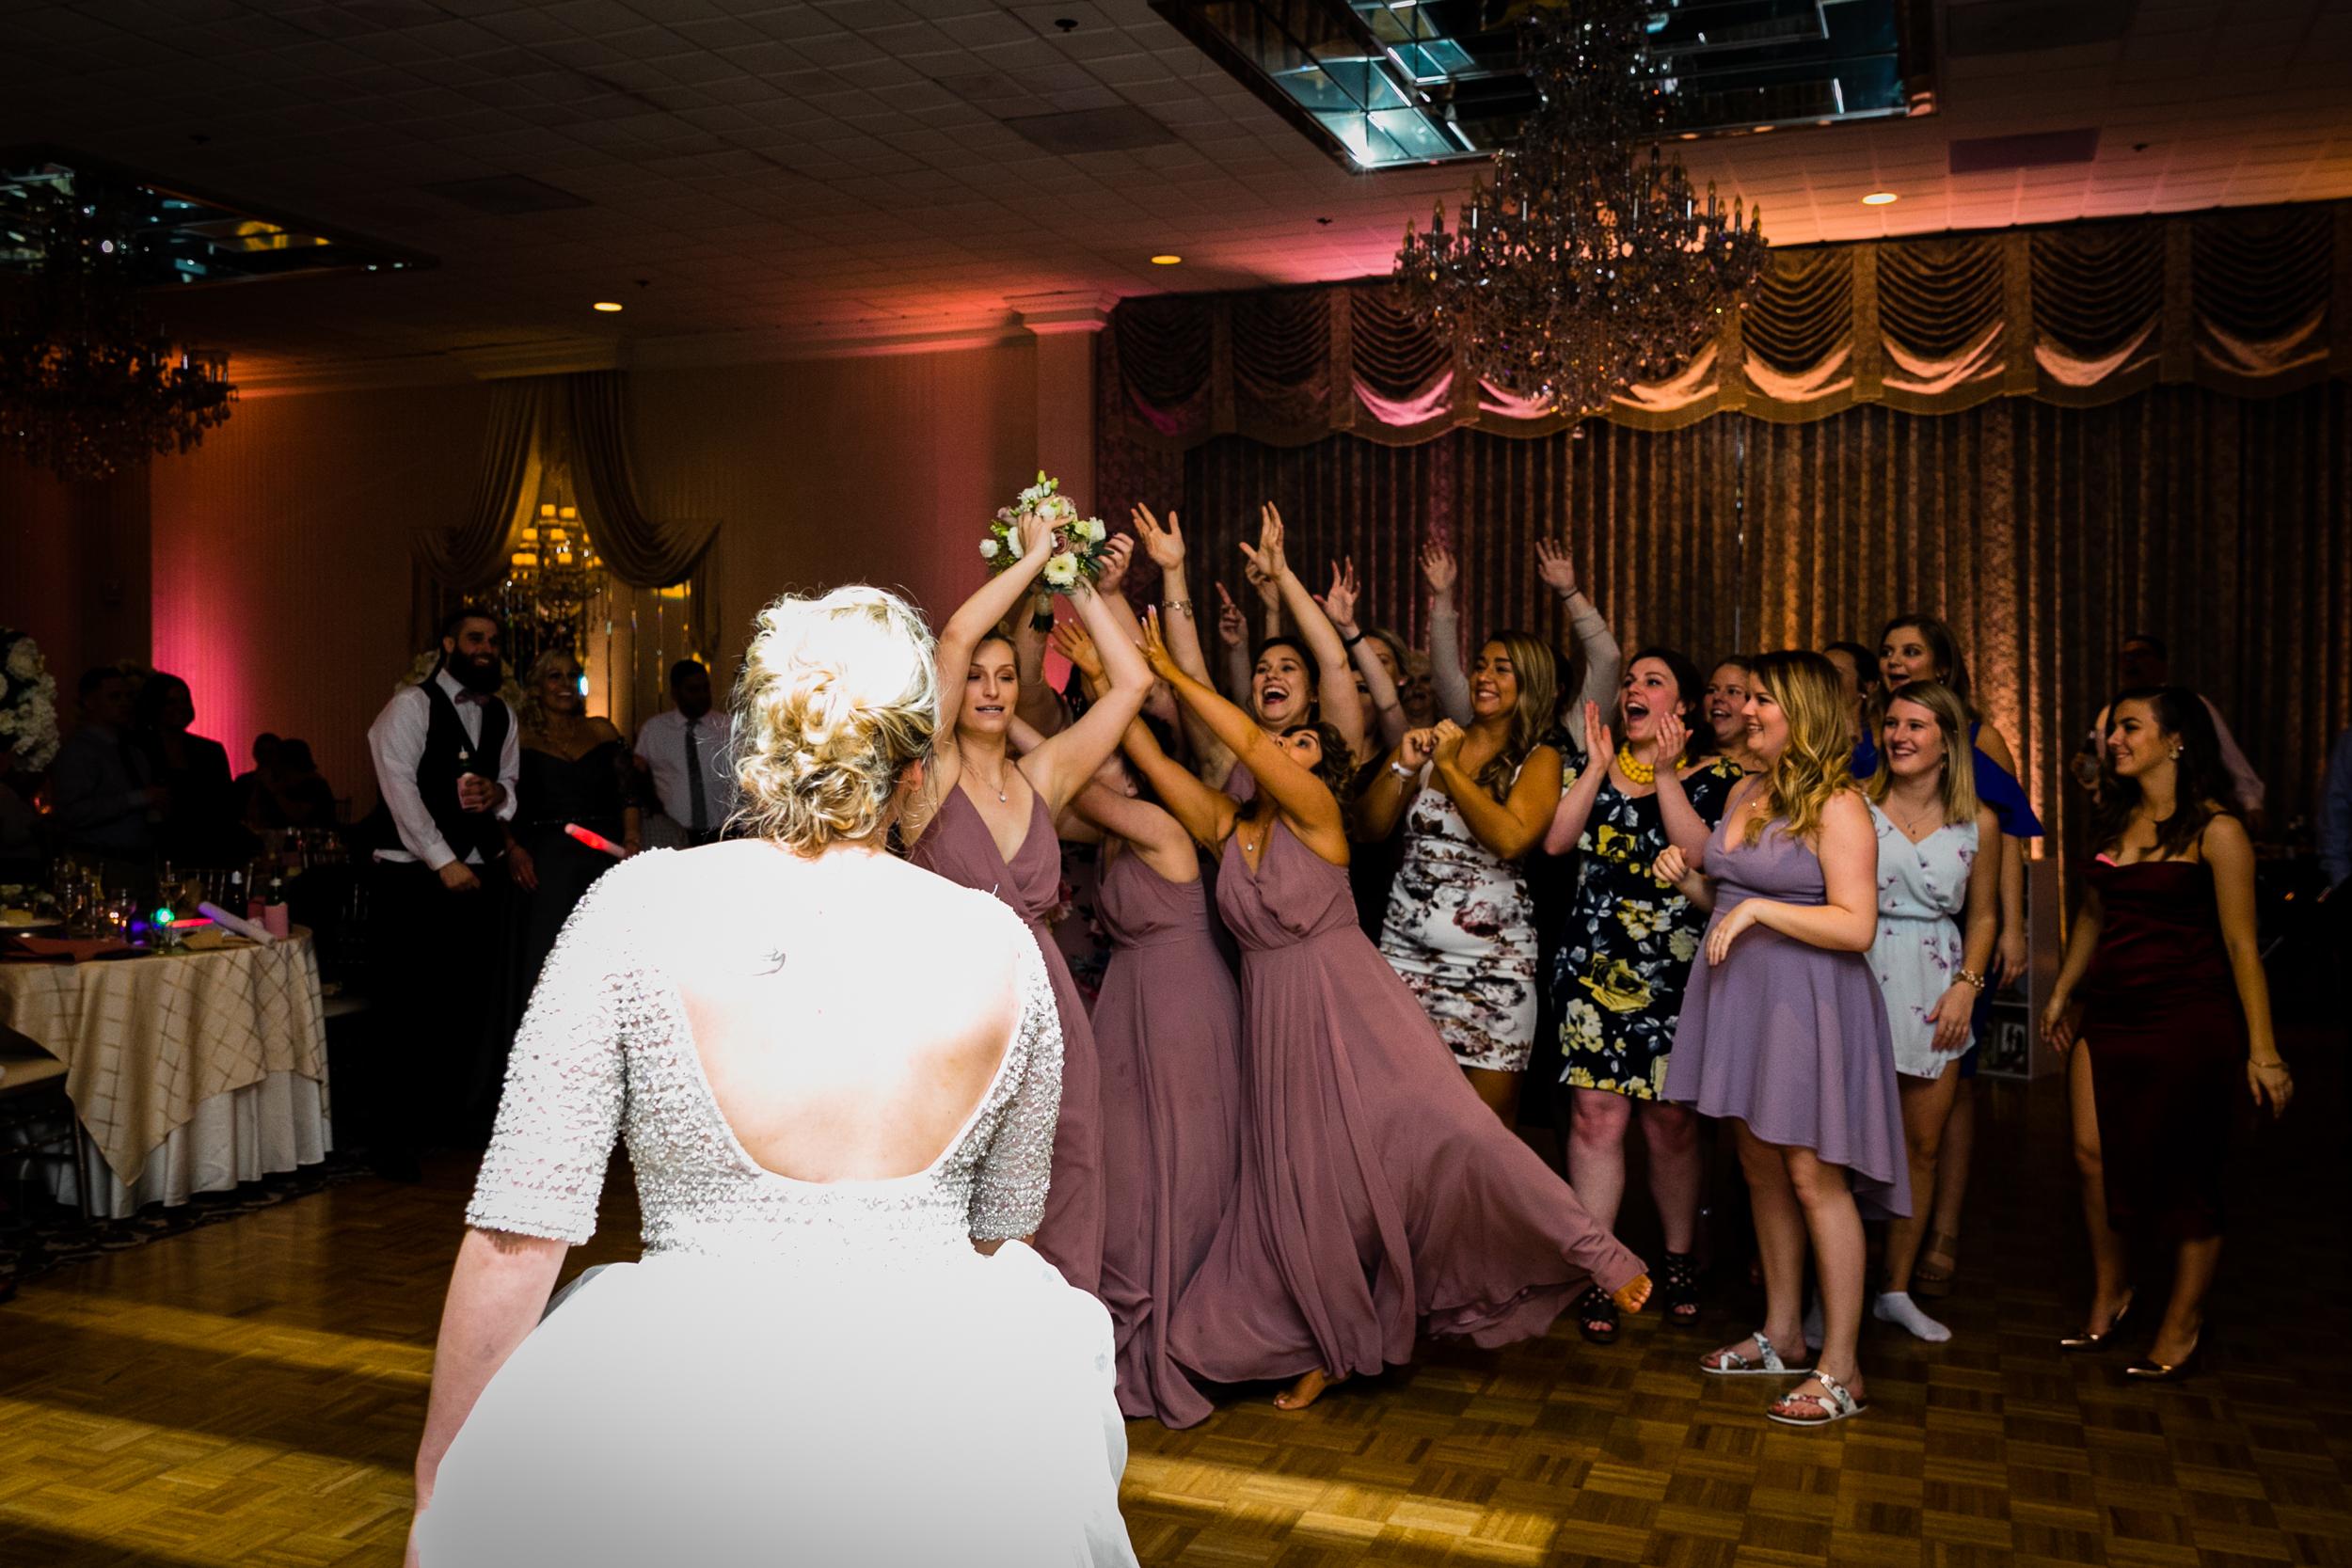 CELEBRATIONS BENSALEM WEDDING PHOTOGRAPHY-112.jpg